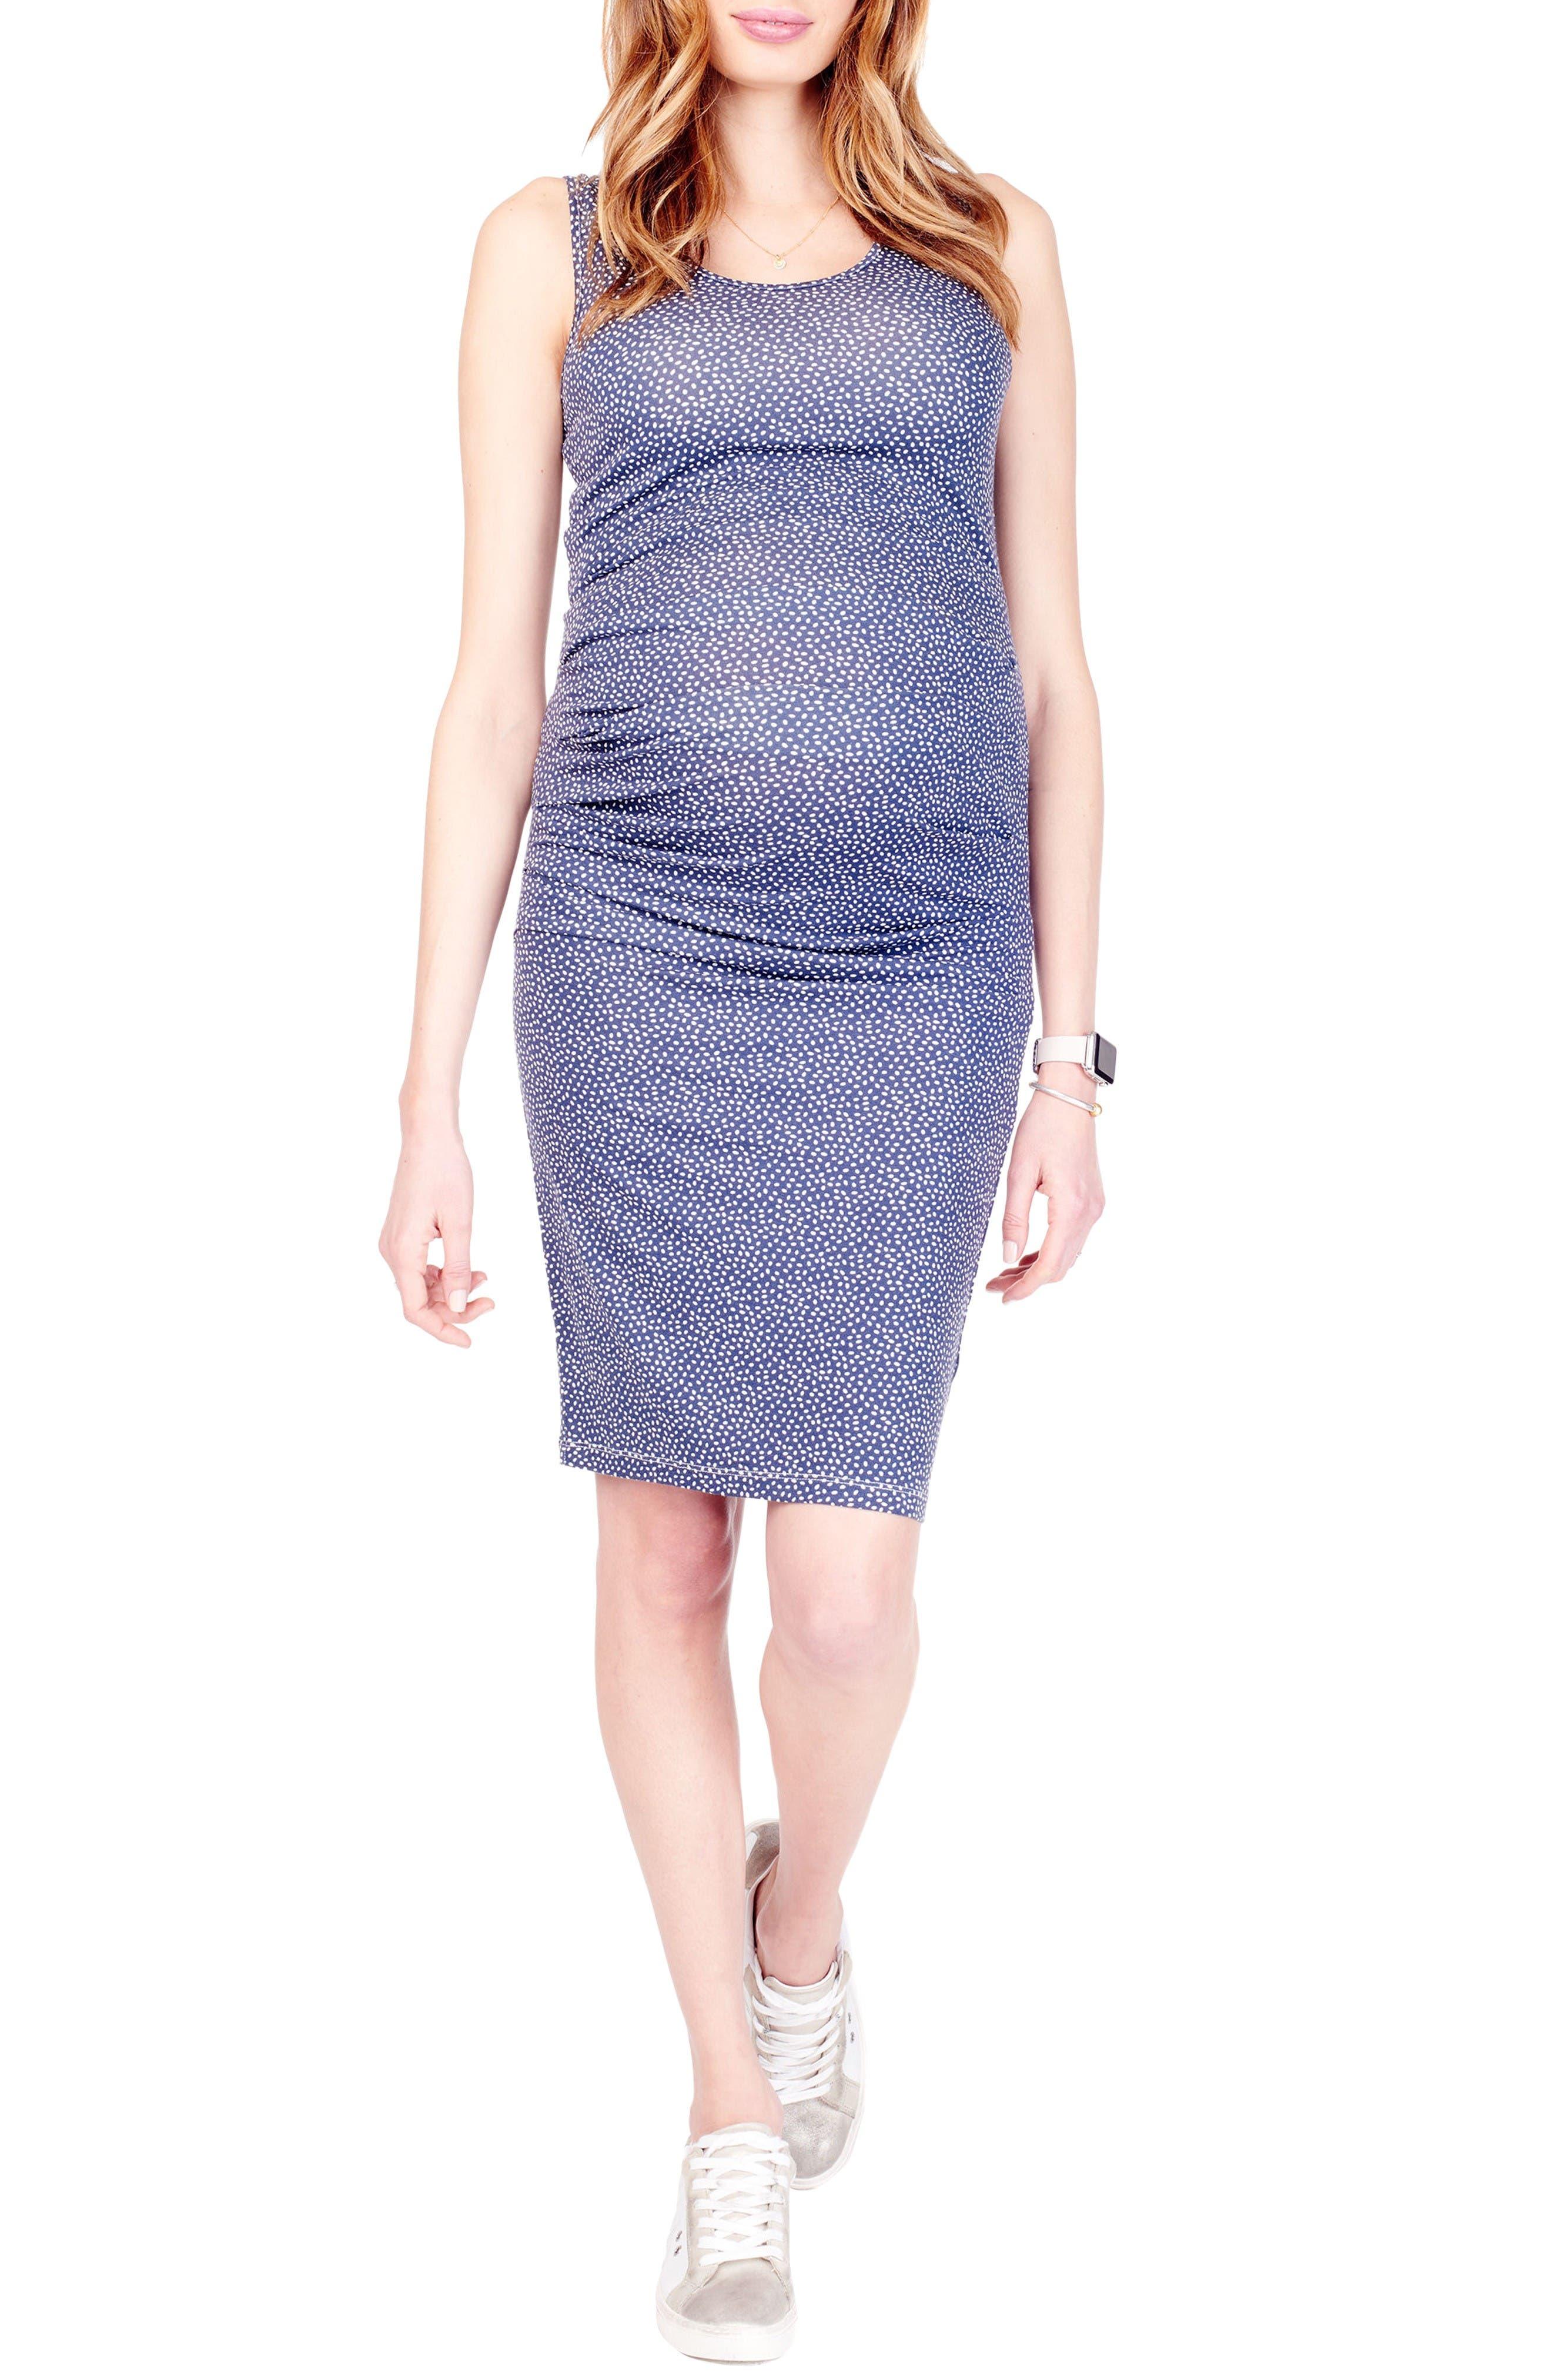 Alternate Image 1 Selected - Ingrid & Isabel® Ruched Maternity Tank Dress